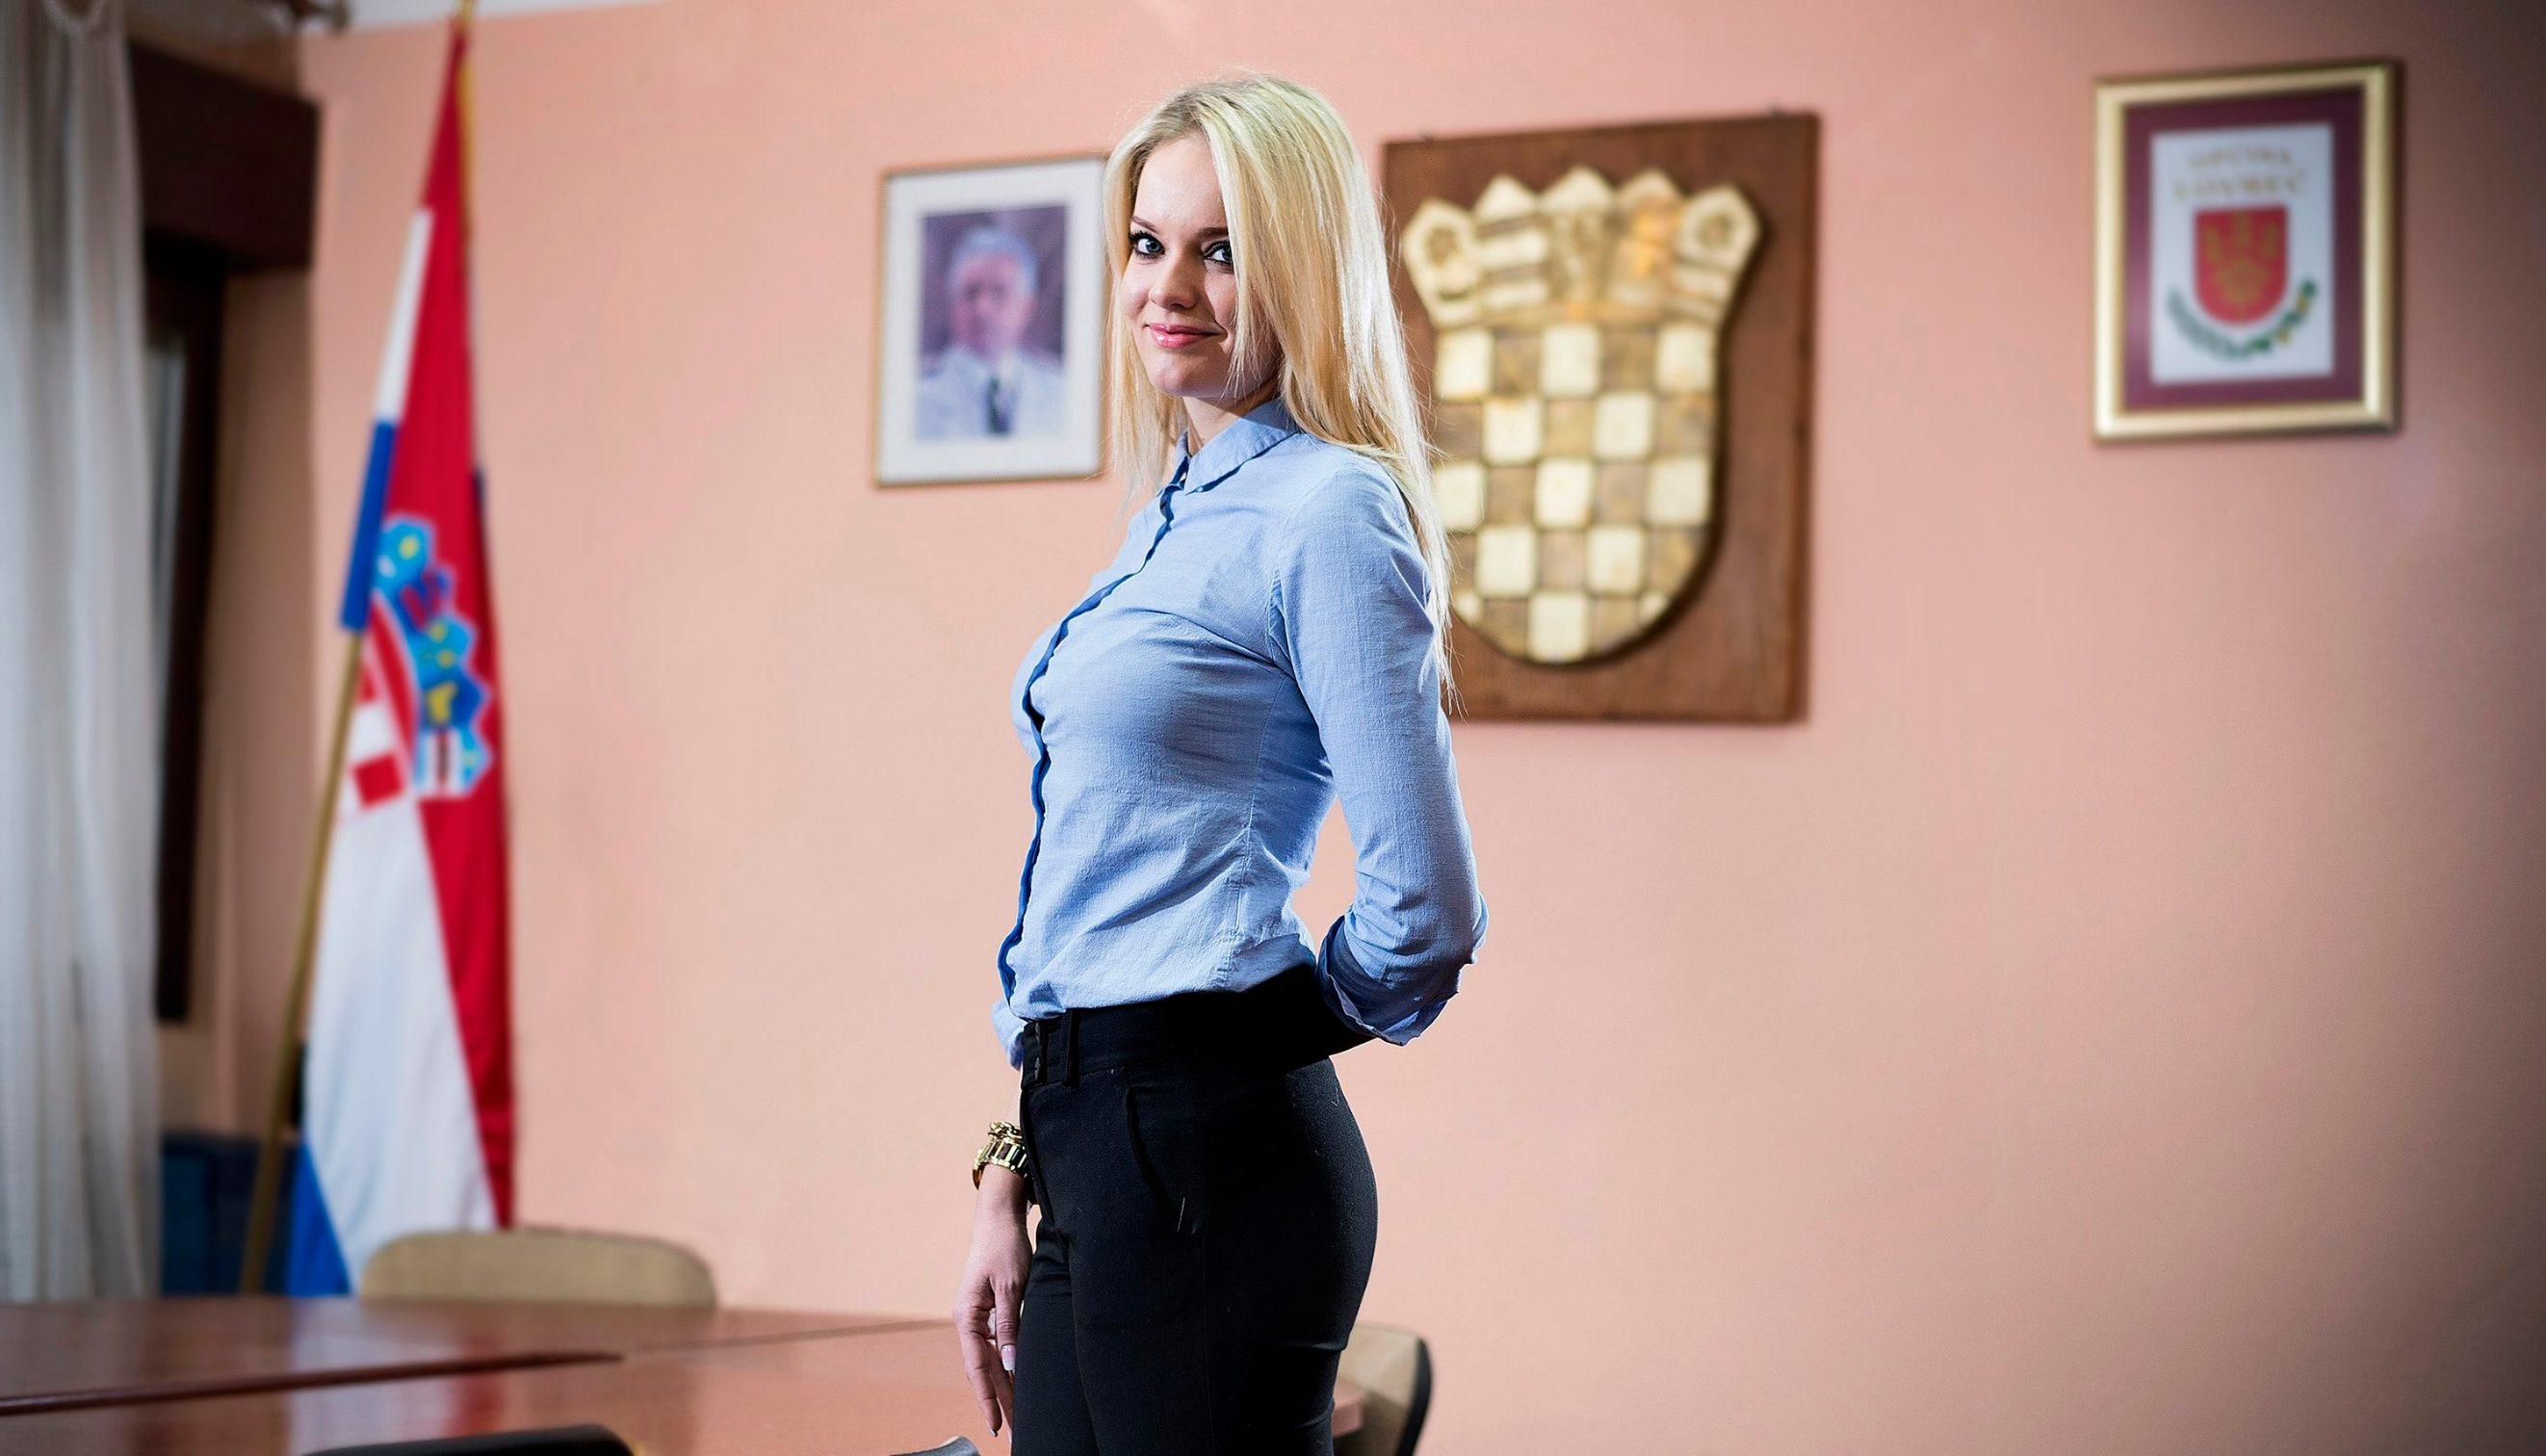 Anita Nosić